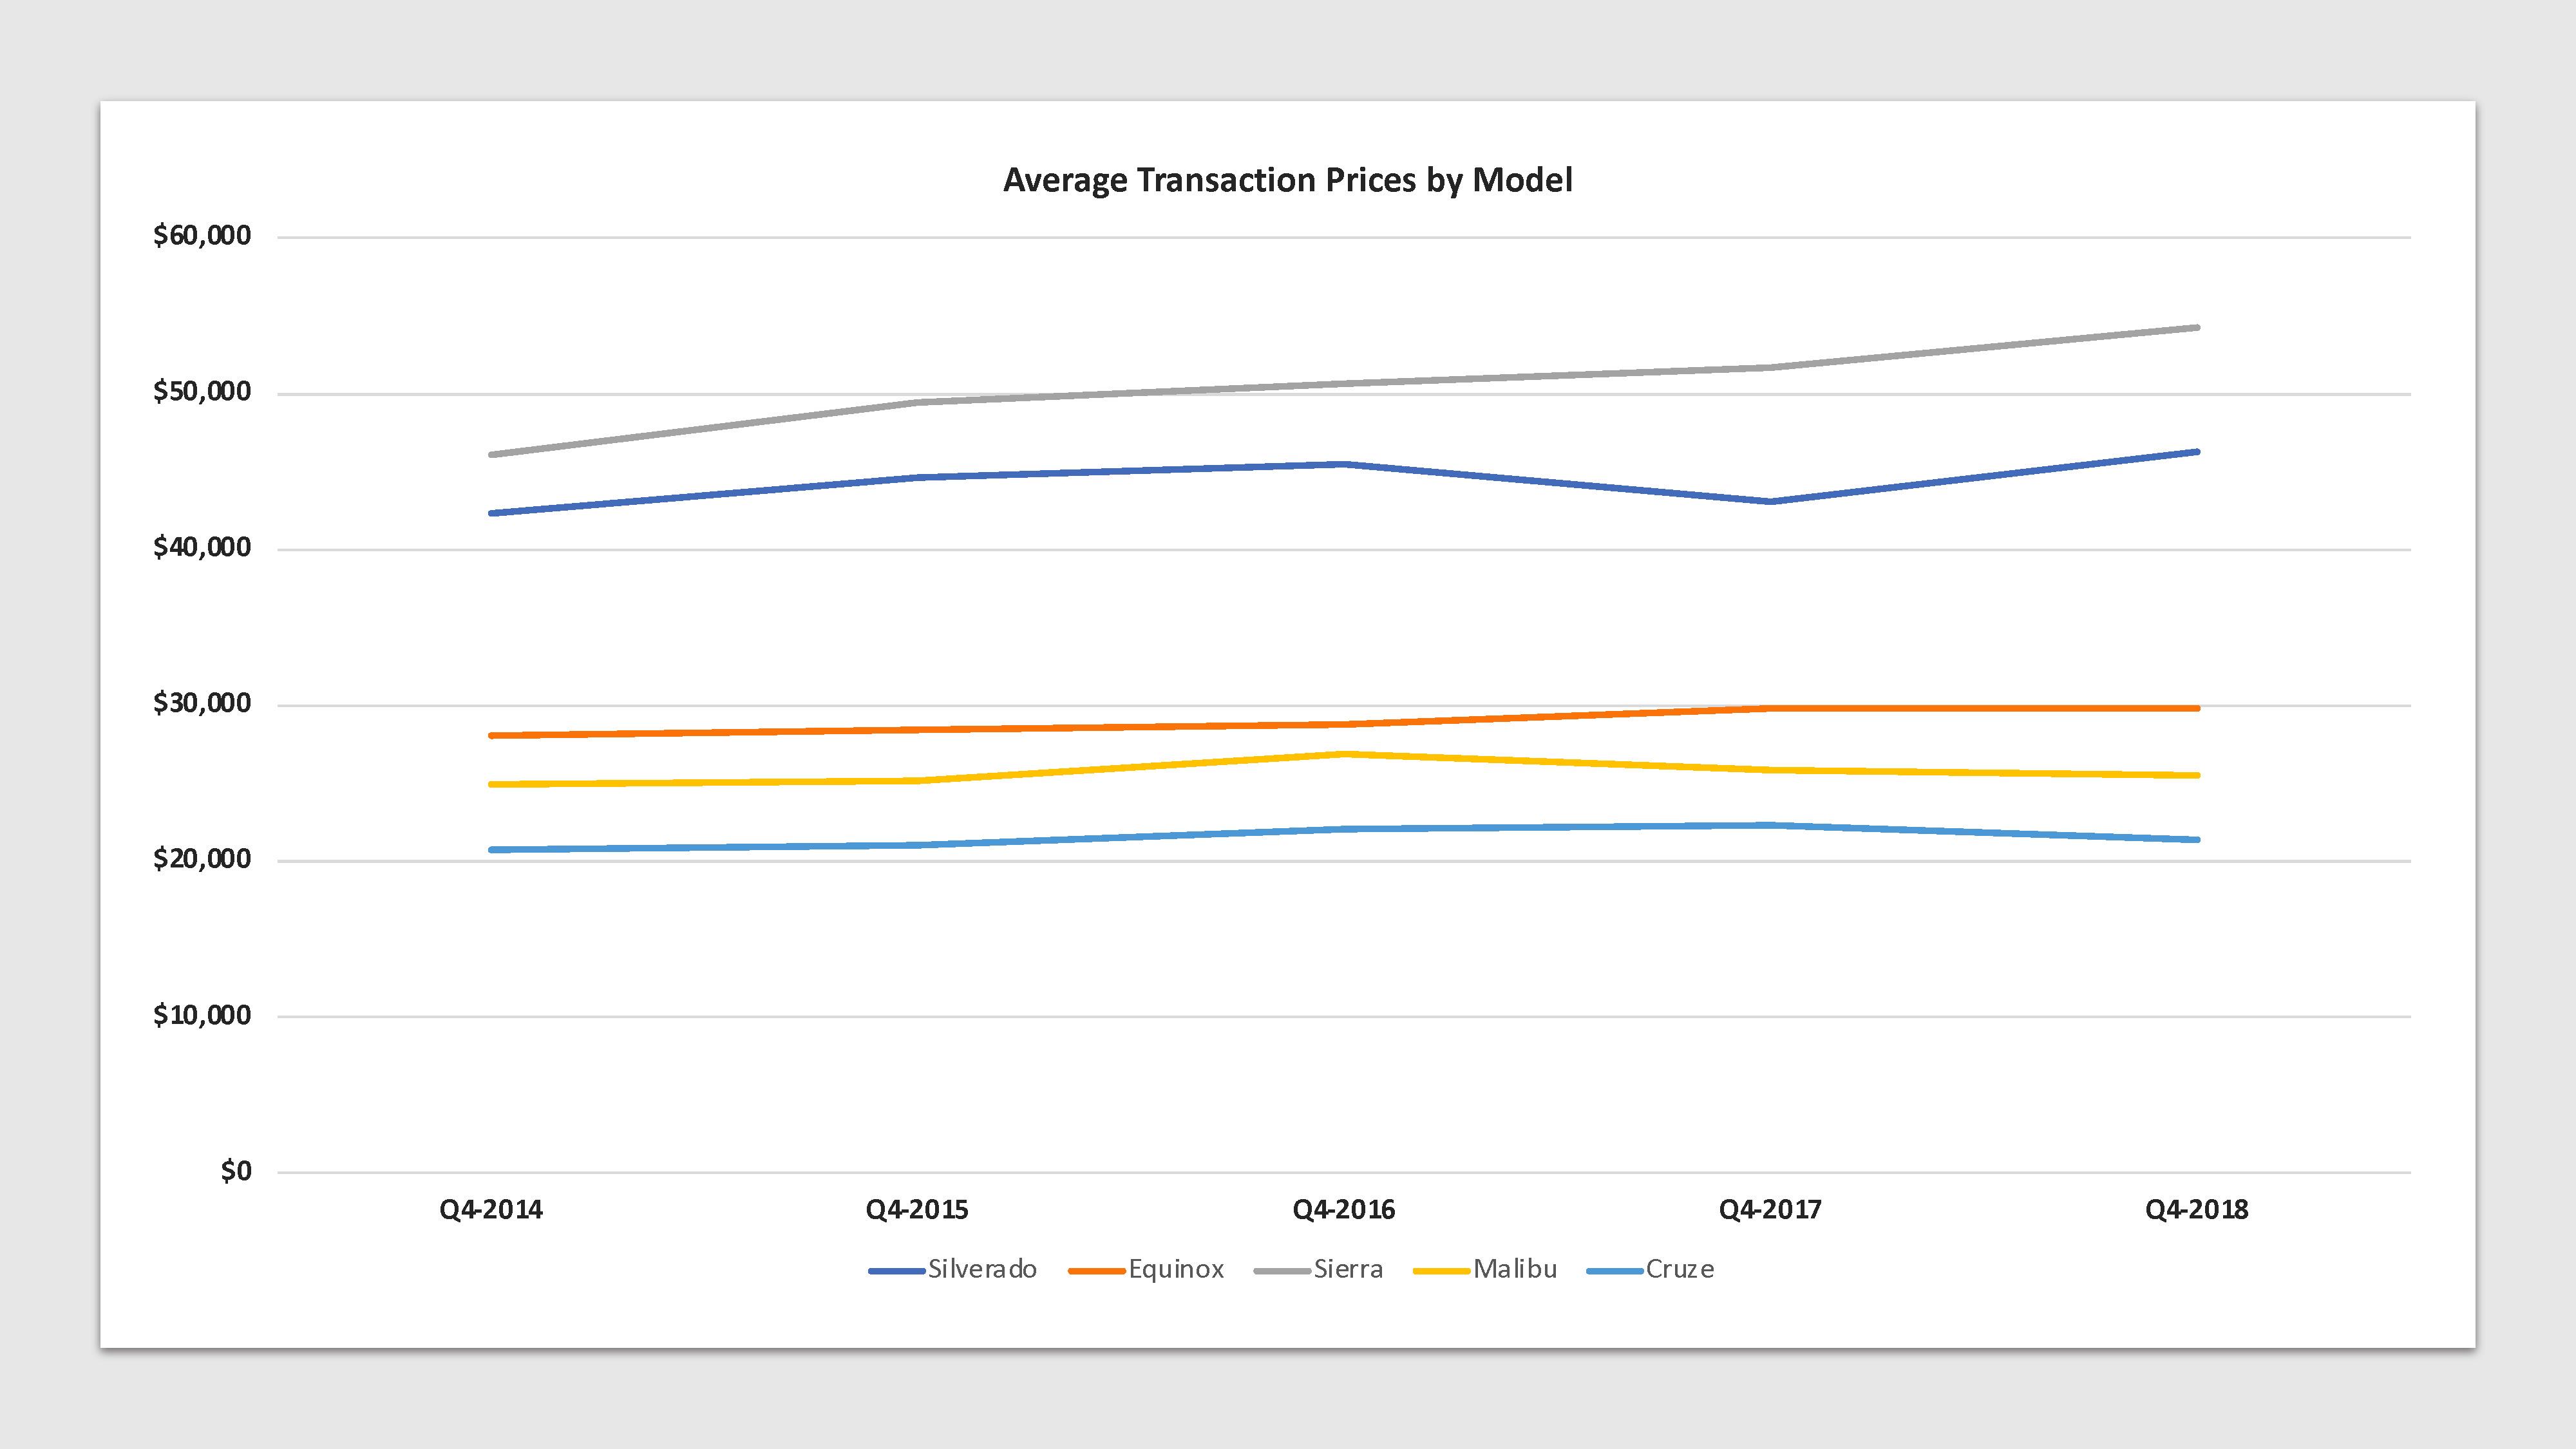 Gm average transaction prices